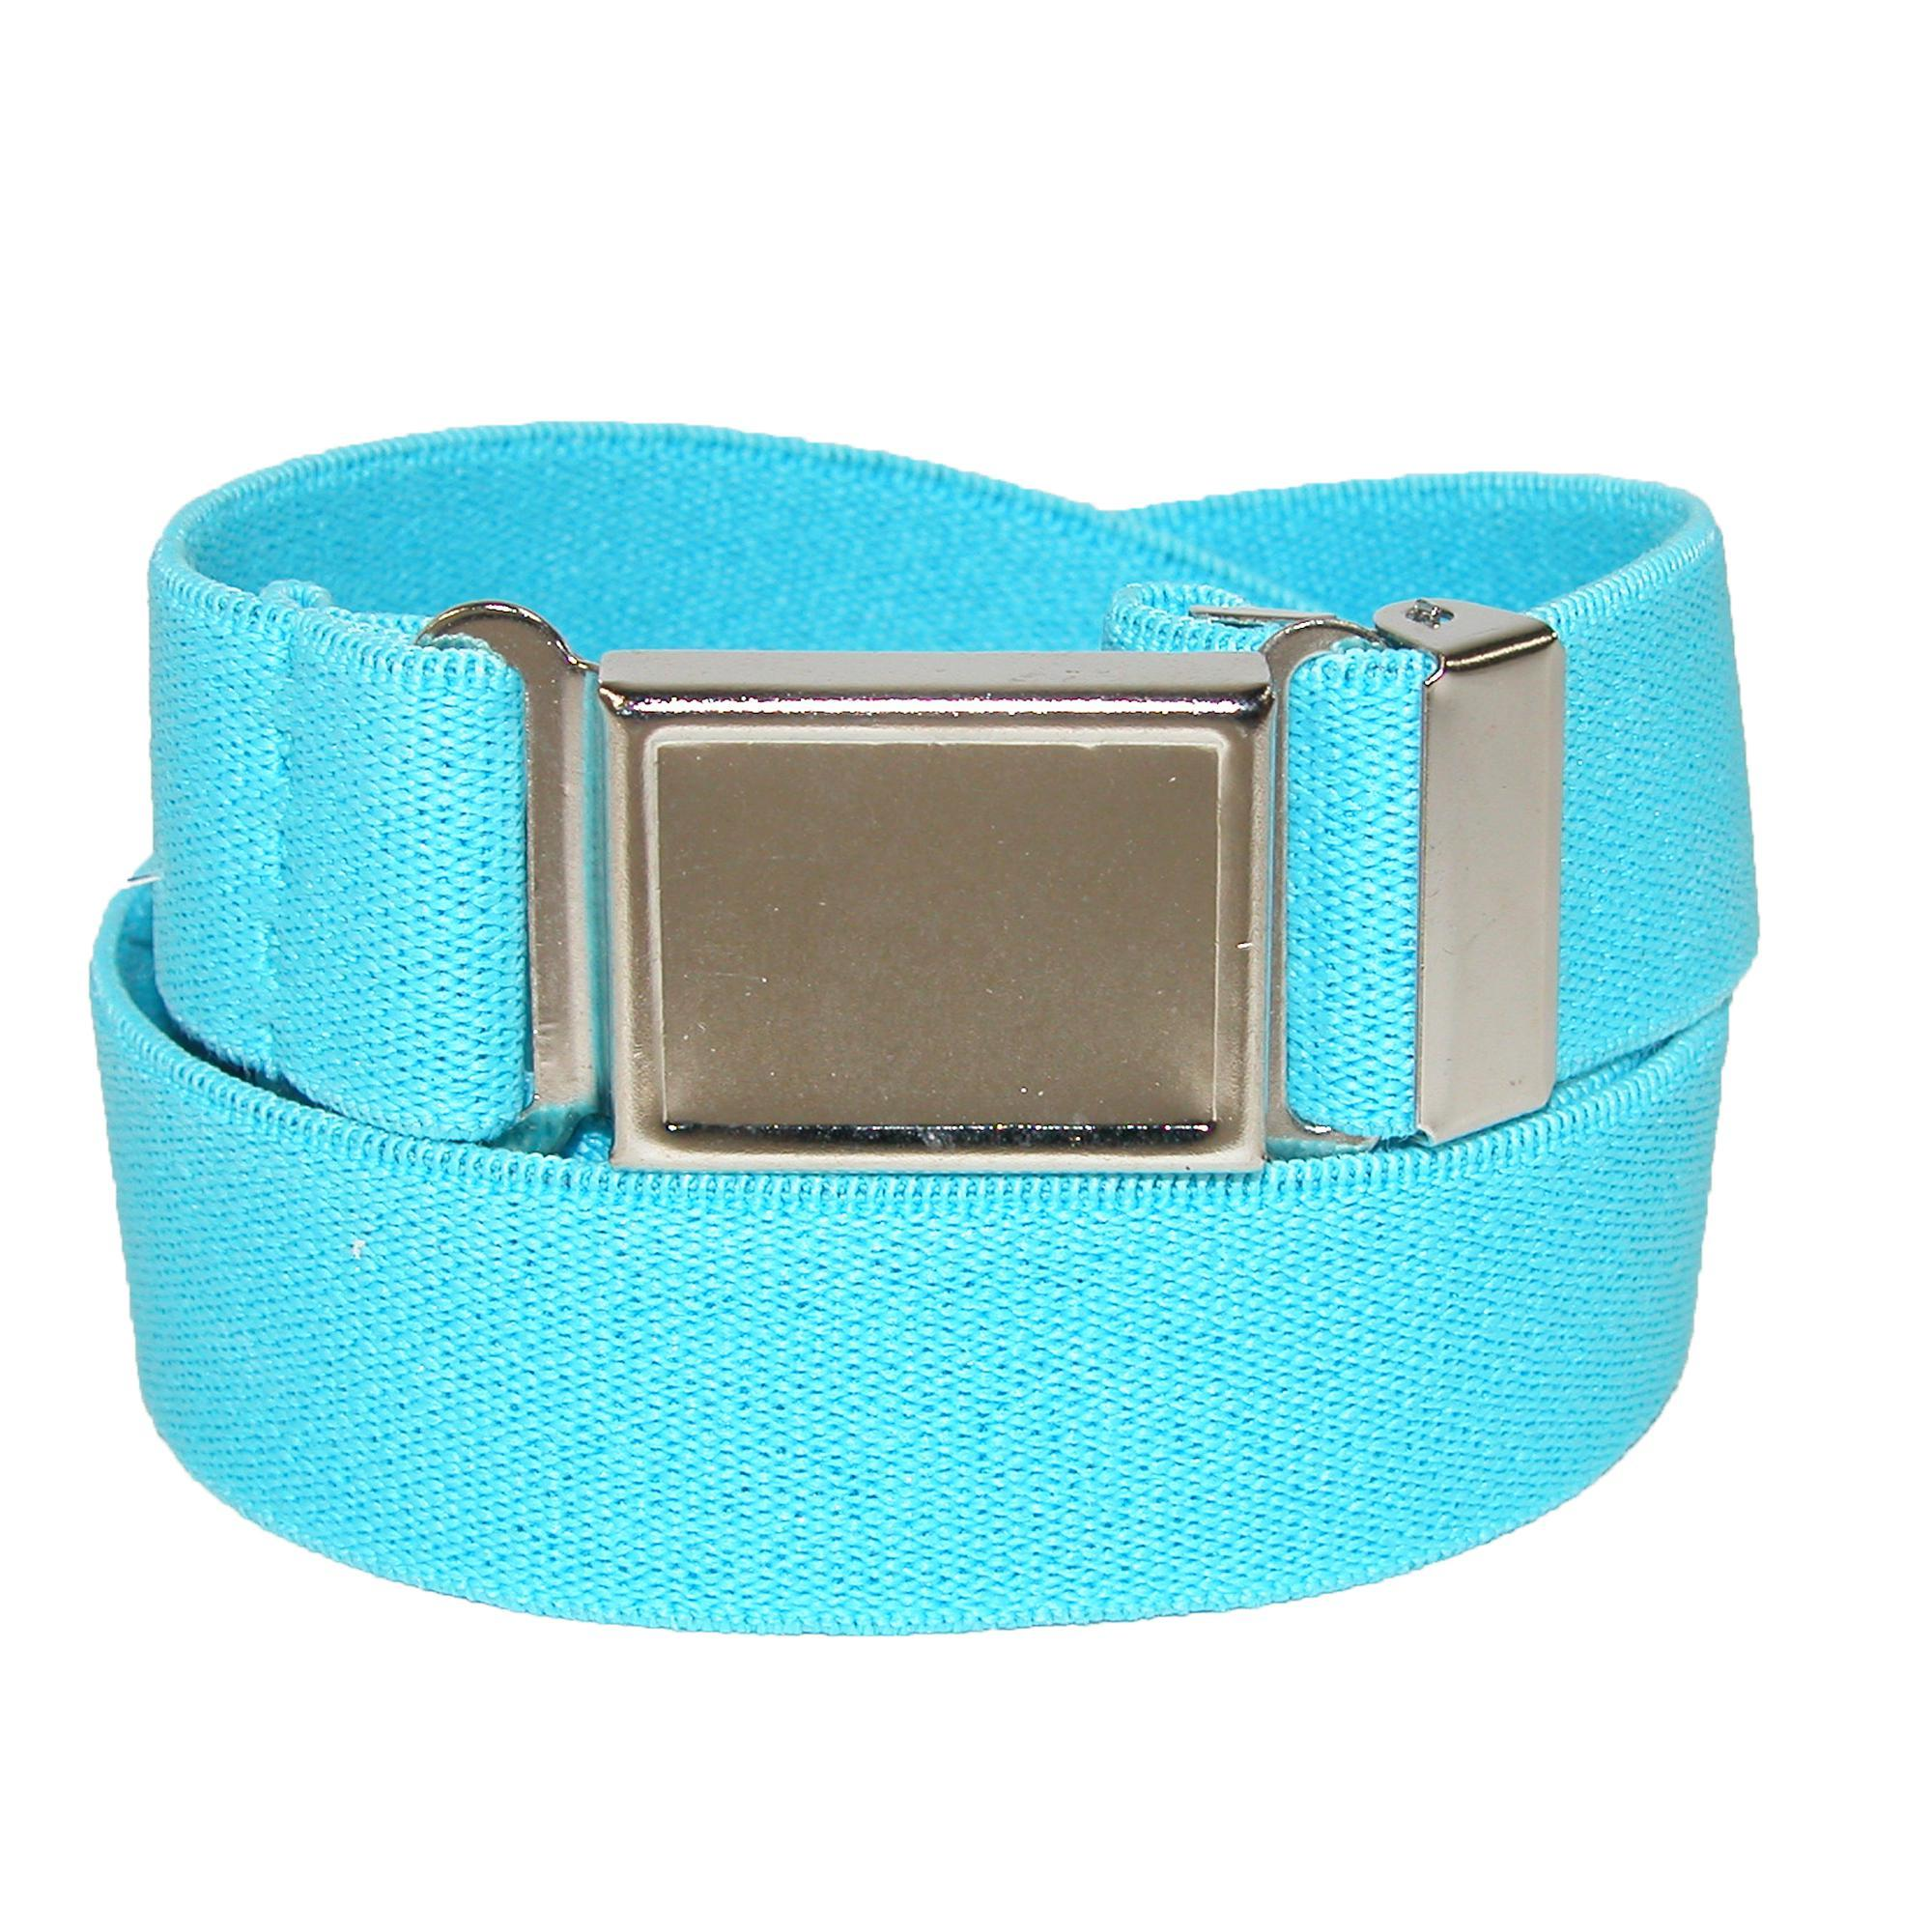 Find great deals on eBay for kids elastic belt. Shop with confidence.